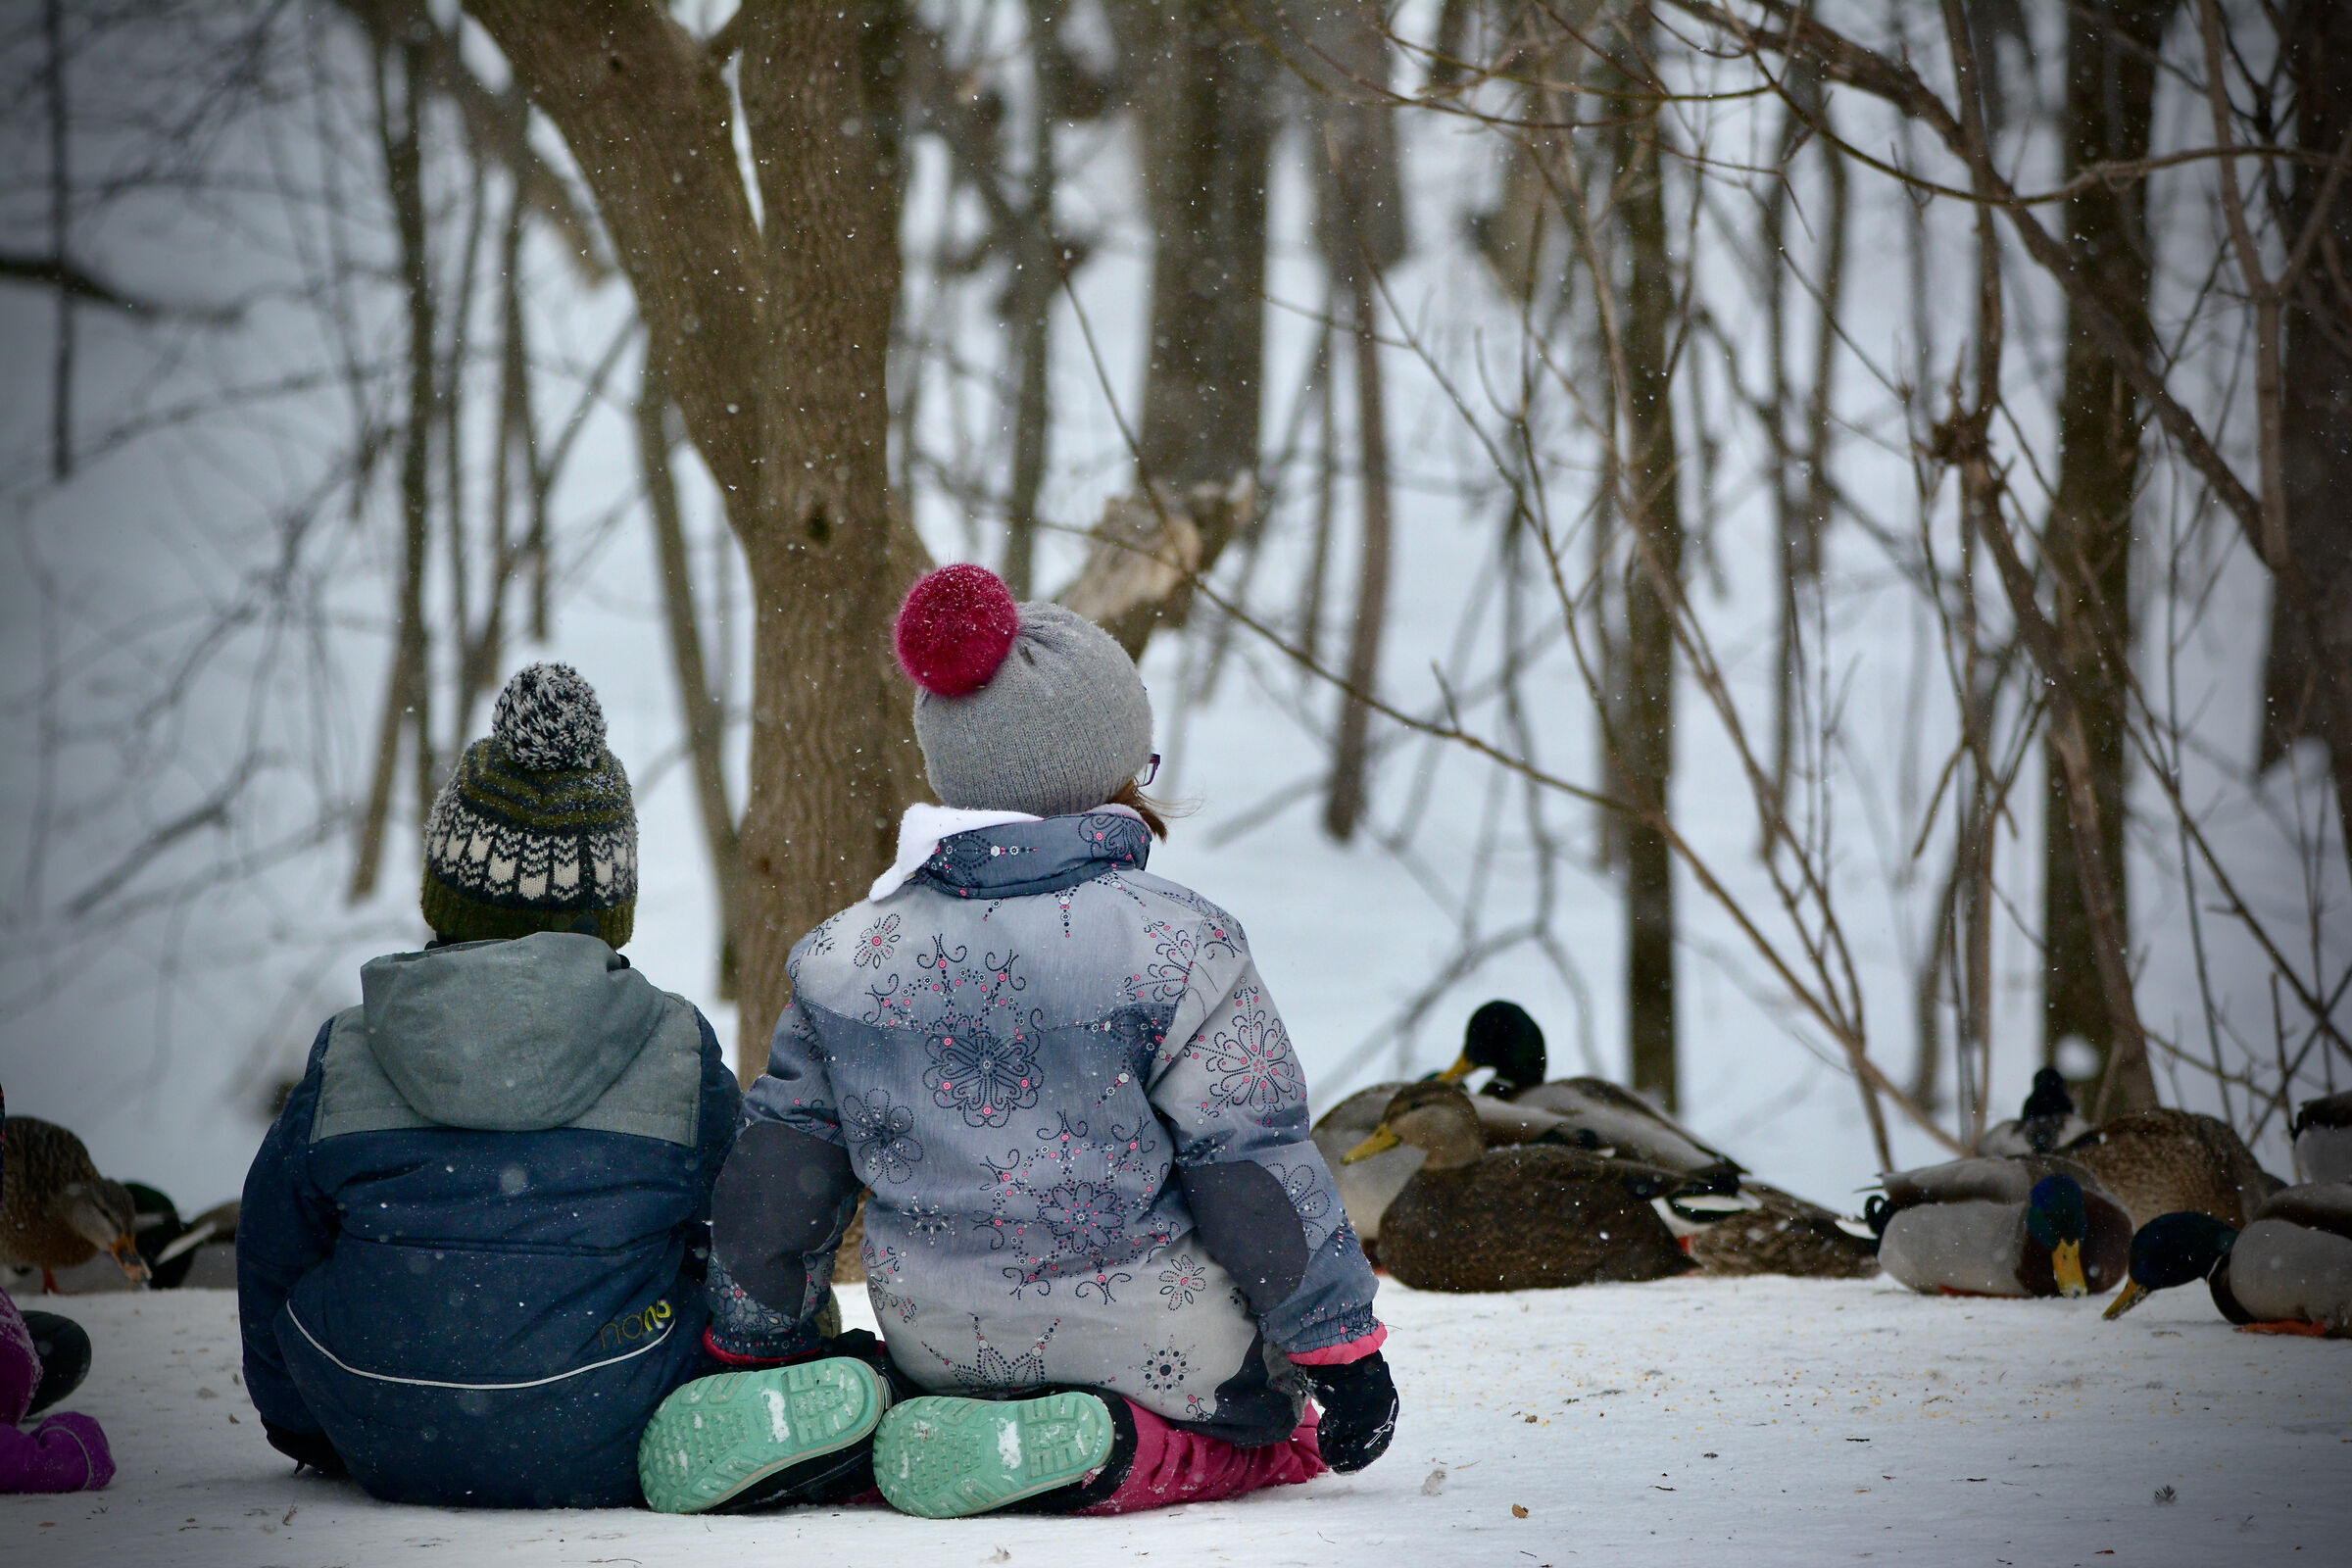 Children watch the ducks spectable in a park...